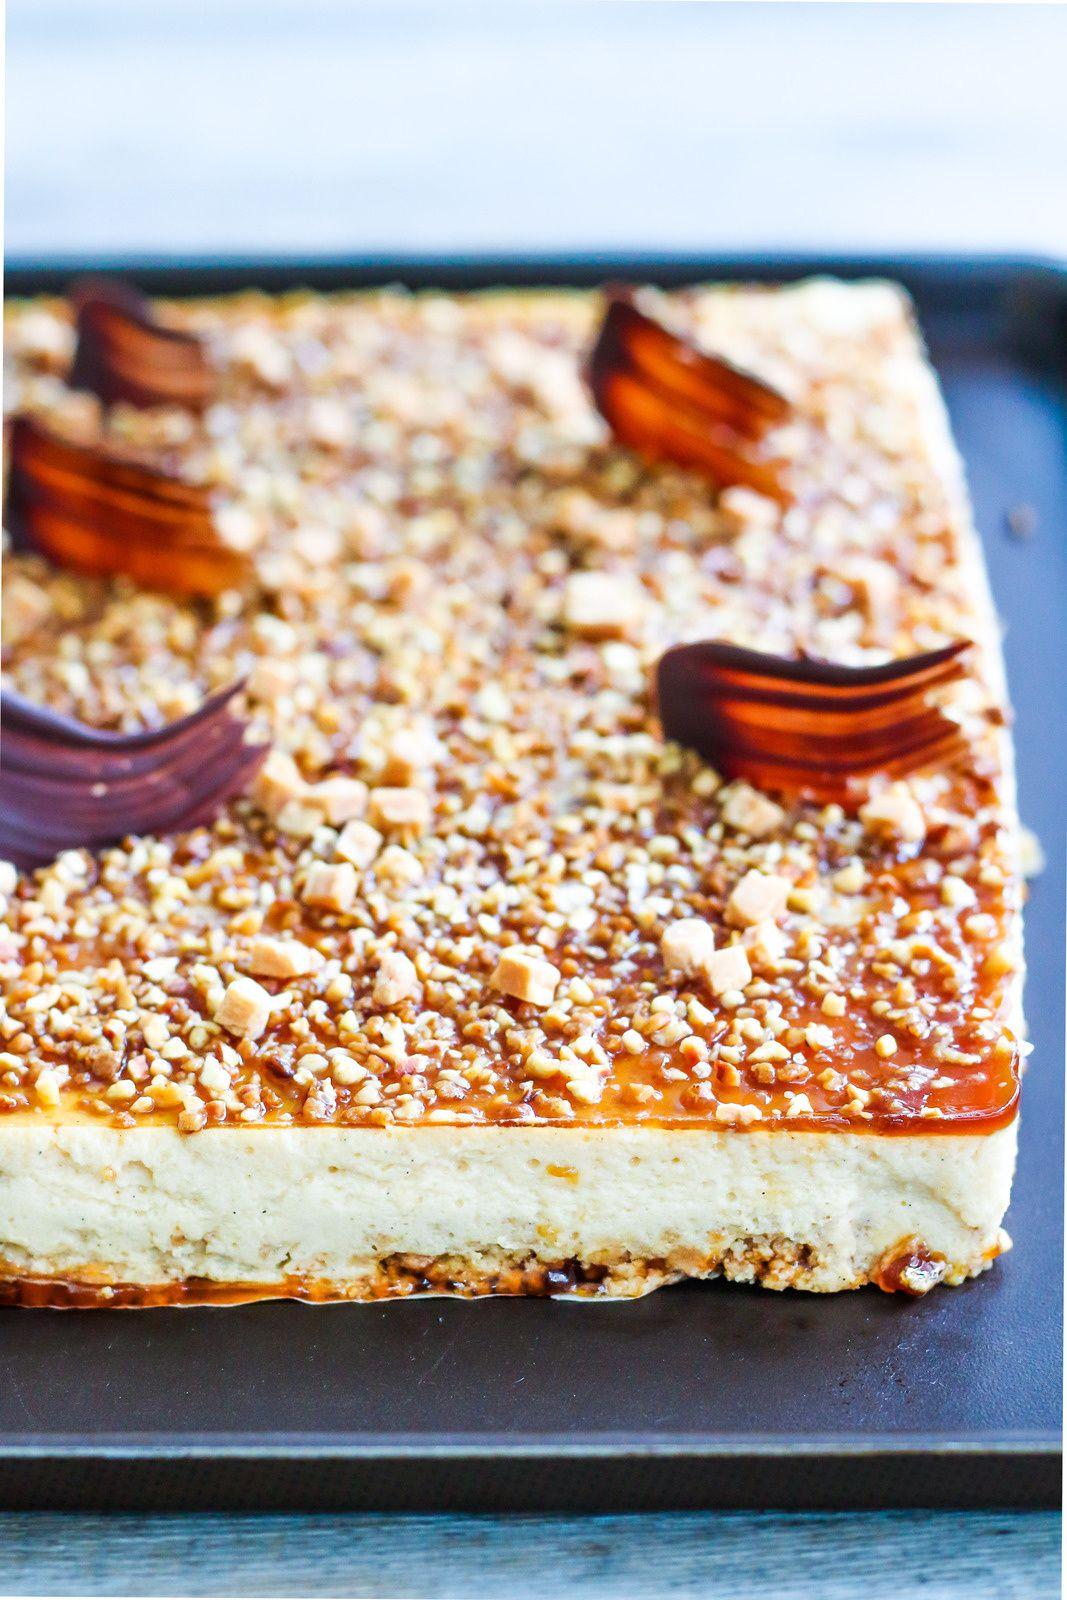 Entremet façon bavarois vanille & caramel